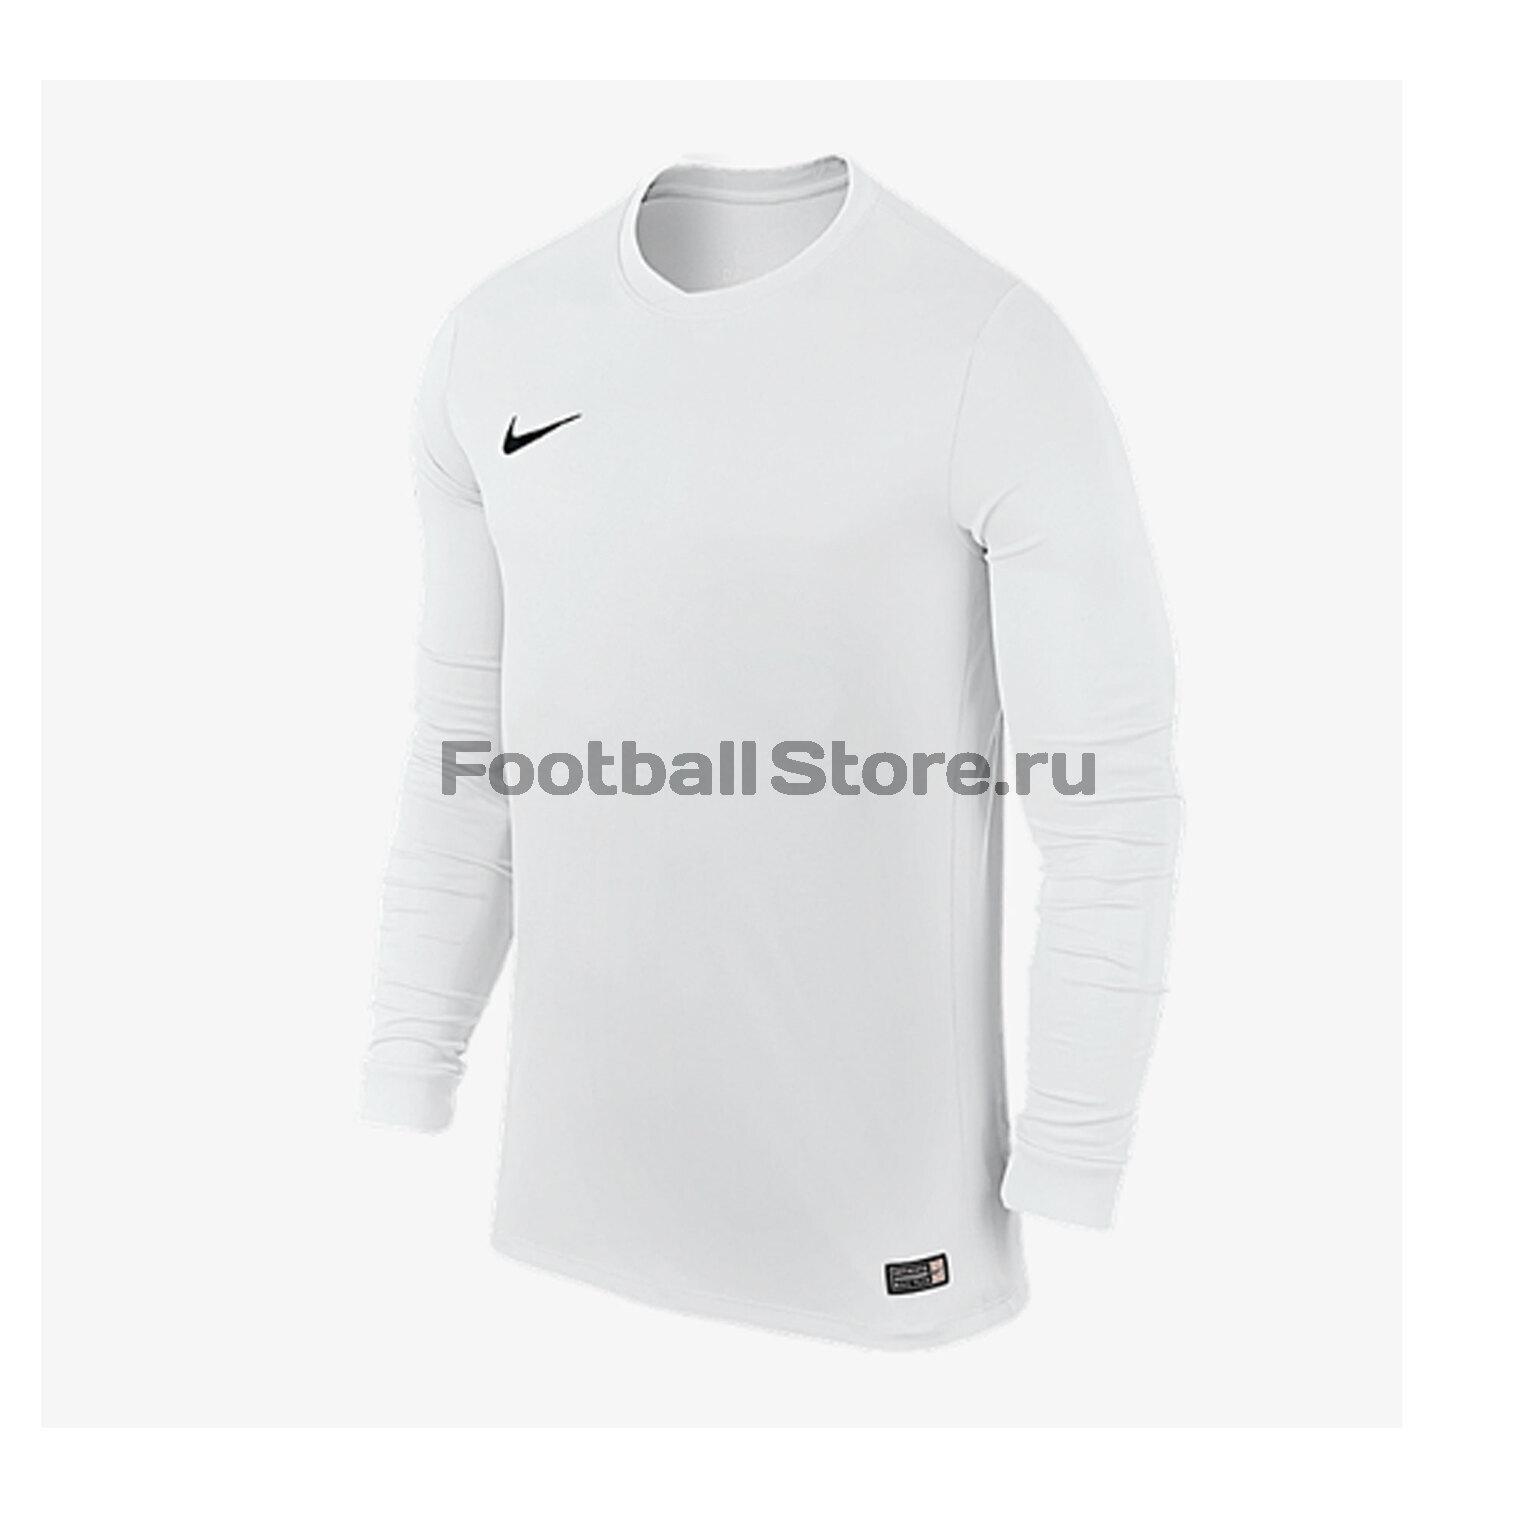 Футболка игровая подростковая Nike Park VI JSY 725970-100 цена